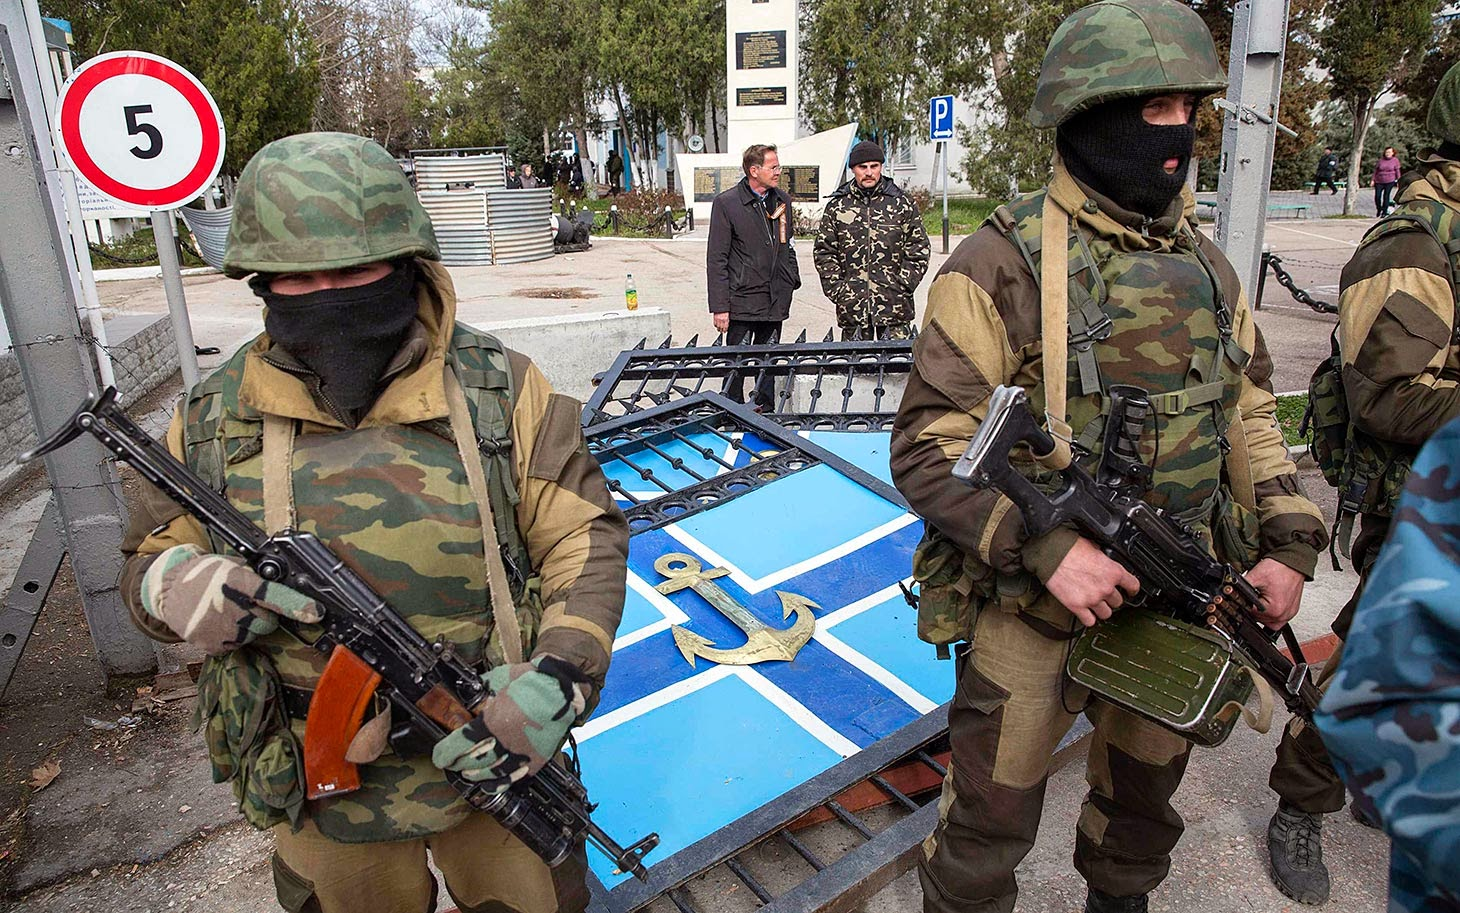 http://2.bp.blogspot.com/-jZhpbnRoj9o/UzsTI6NIrVI/AAAAAAAAA-Y/-V8Tiu4i48Q/s1600/crimea_russians_031914.jpg